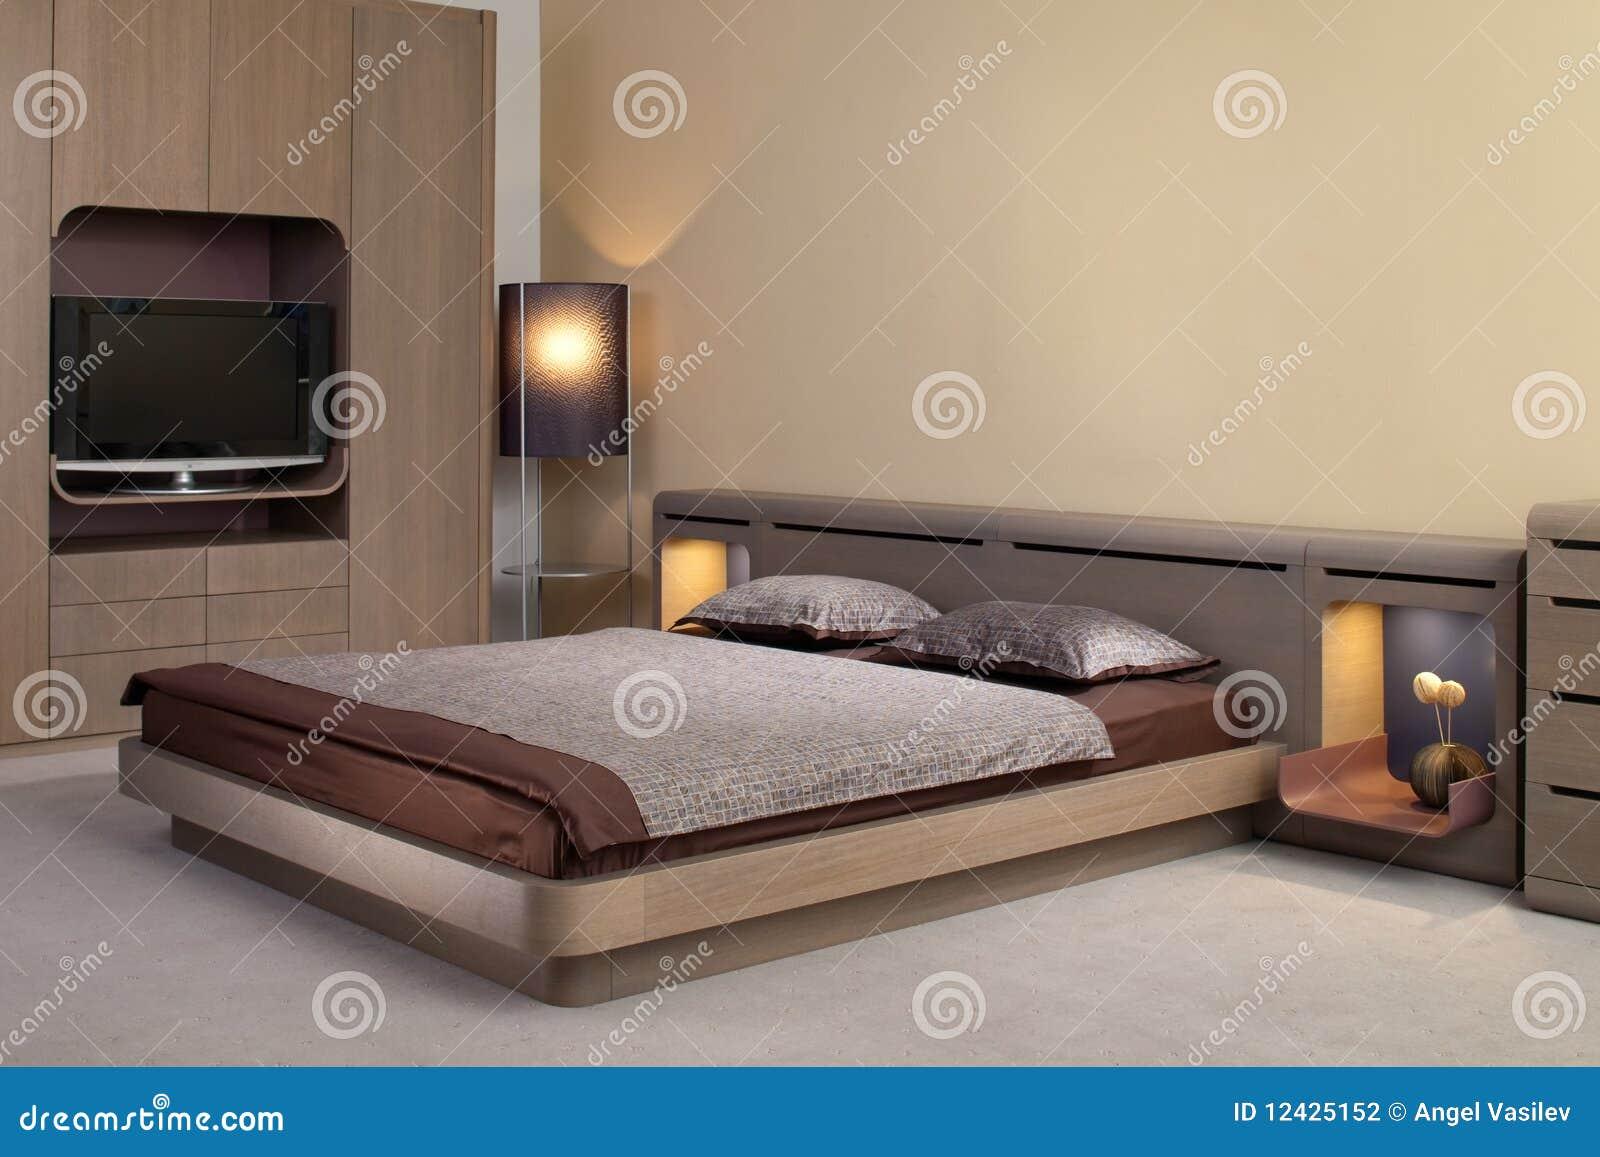 Beautiful and modern bedroom interior design stock for Beautiful bedroom interior